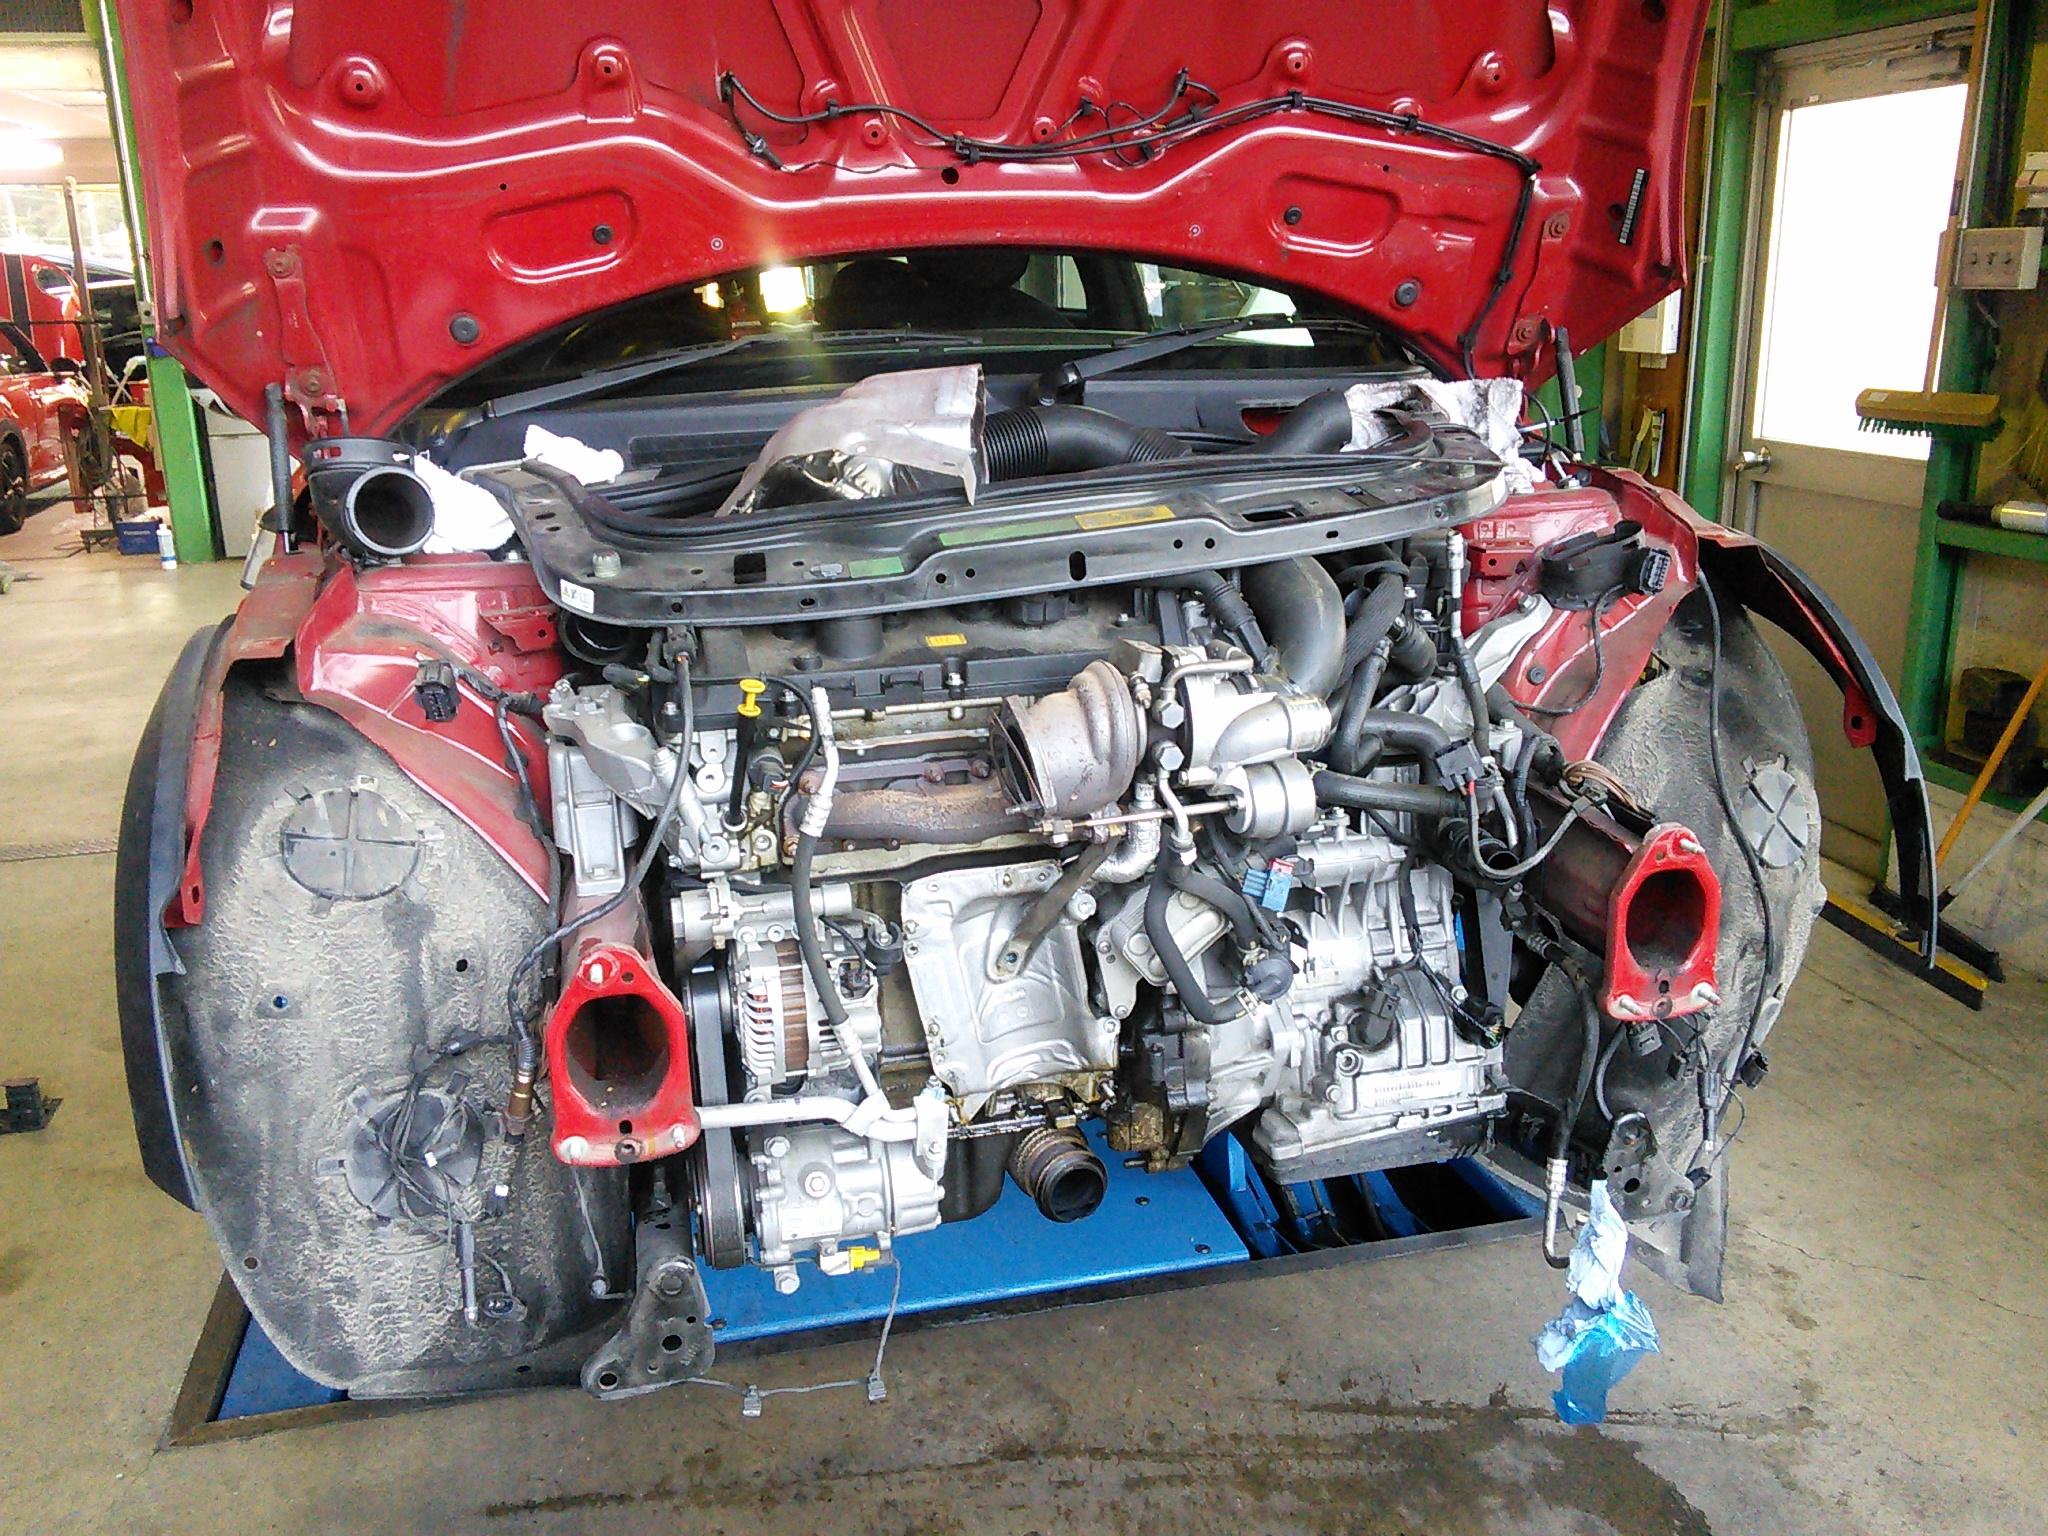 BMWミニ&320 オイル漏れ修理 冬になるとオイル漏れ修理が非常に増えてきます